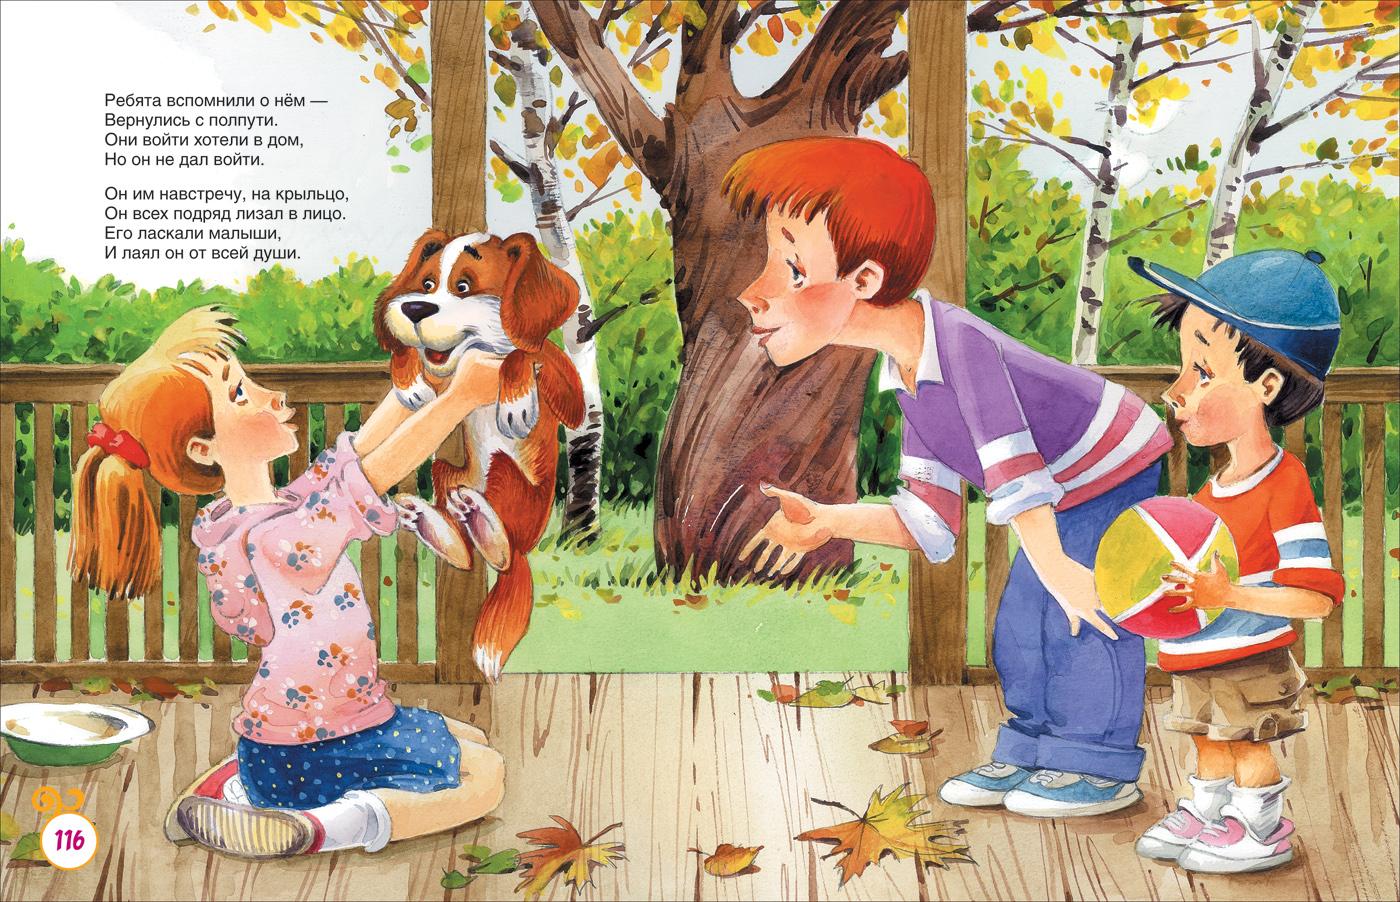 Рисунки и картинки к детским стихами